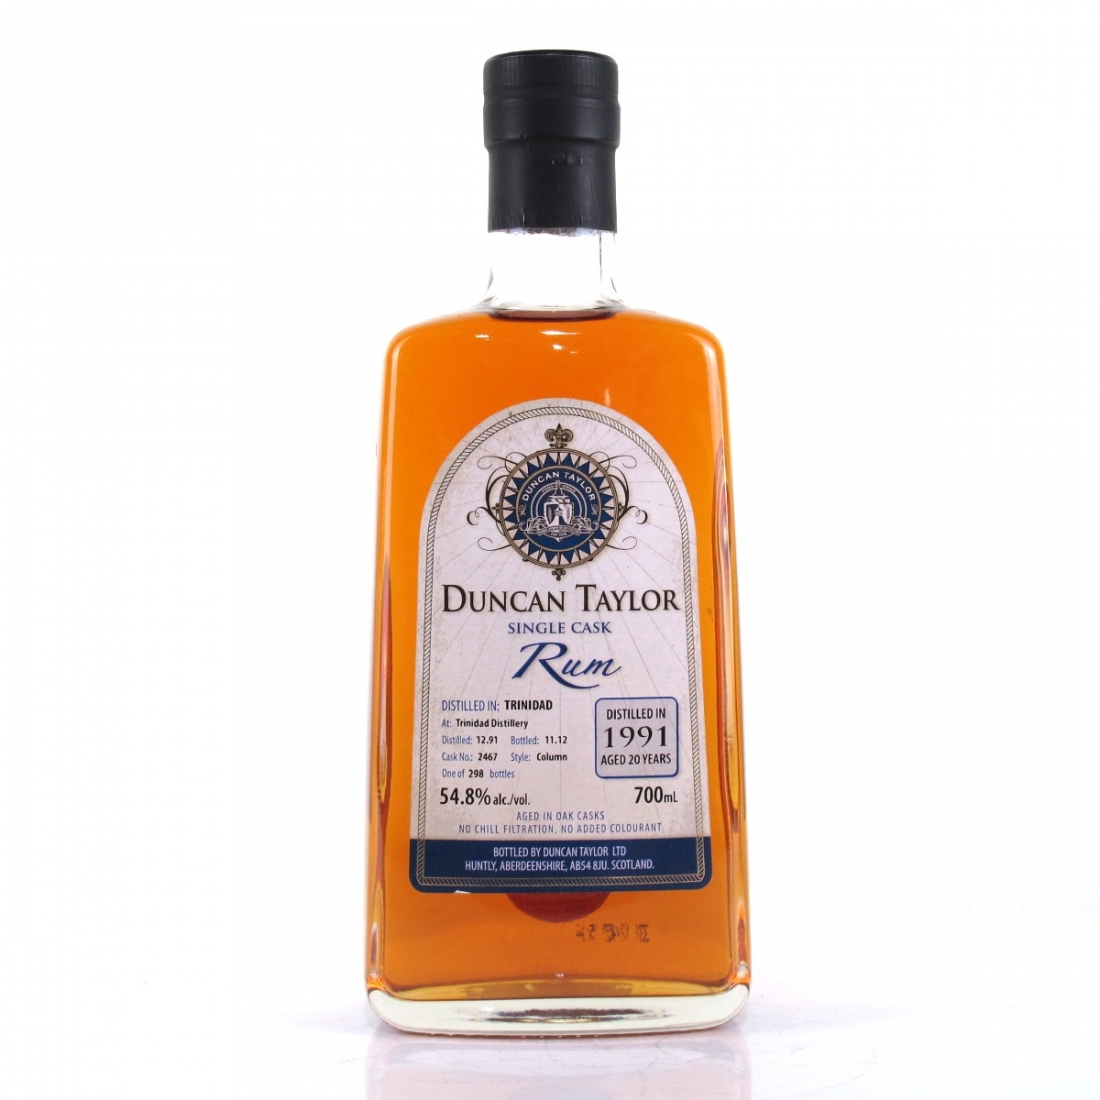 Trinidad 1991 Duncan Taylor 20 Year Old Single Cask Rum